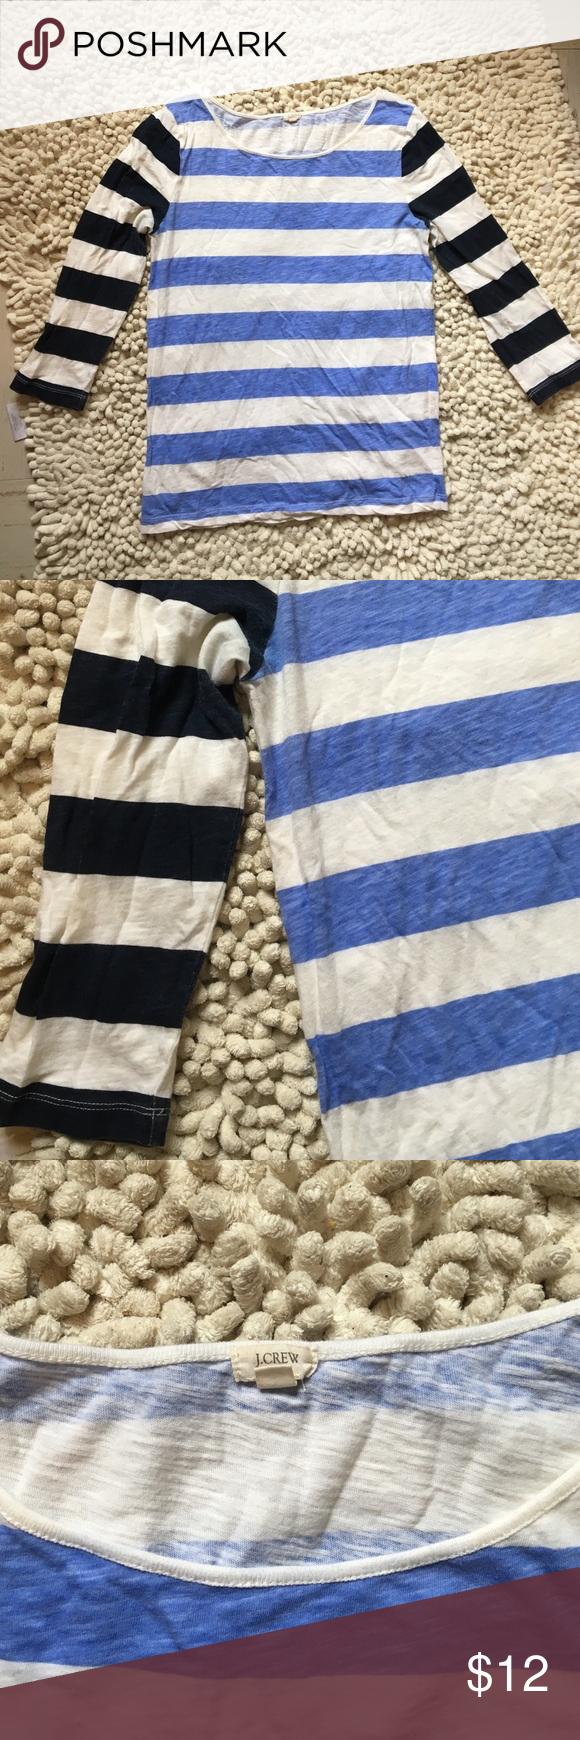 J. Crew stripe 3/4 sleeve top J. Crew stripe 3/4 sleeve top - Small J. Crew Tops Tees - Long Sleeve